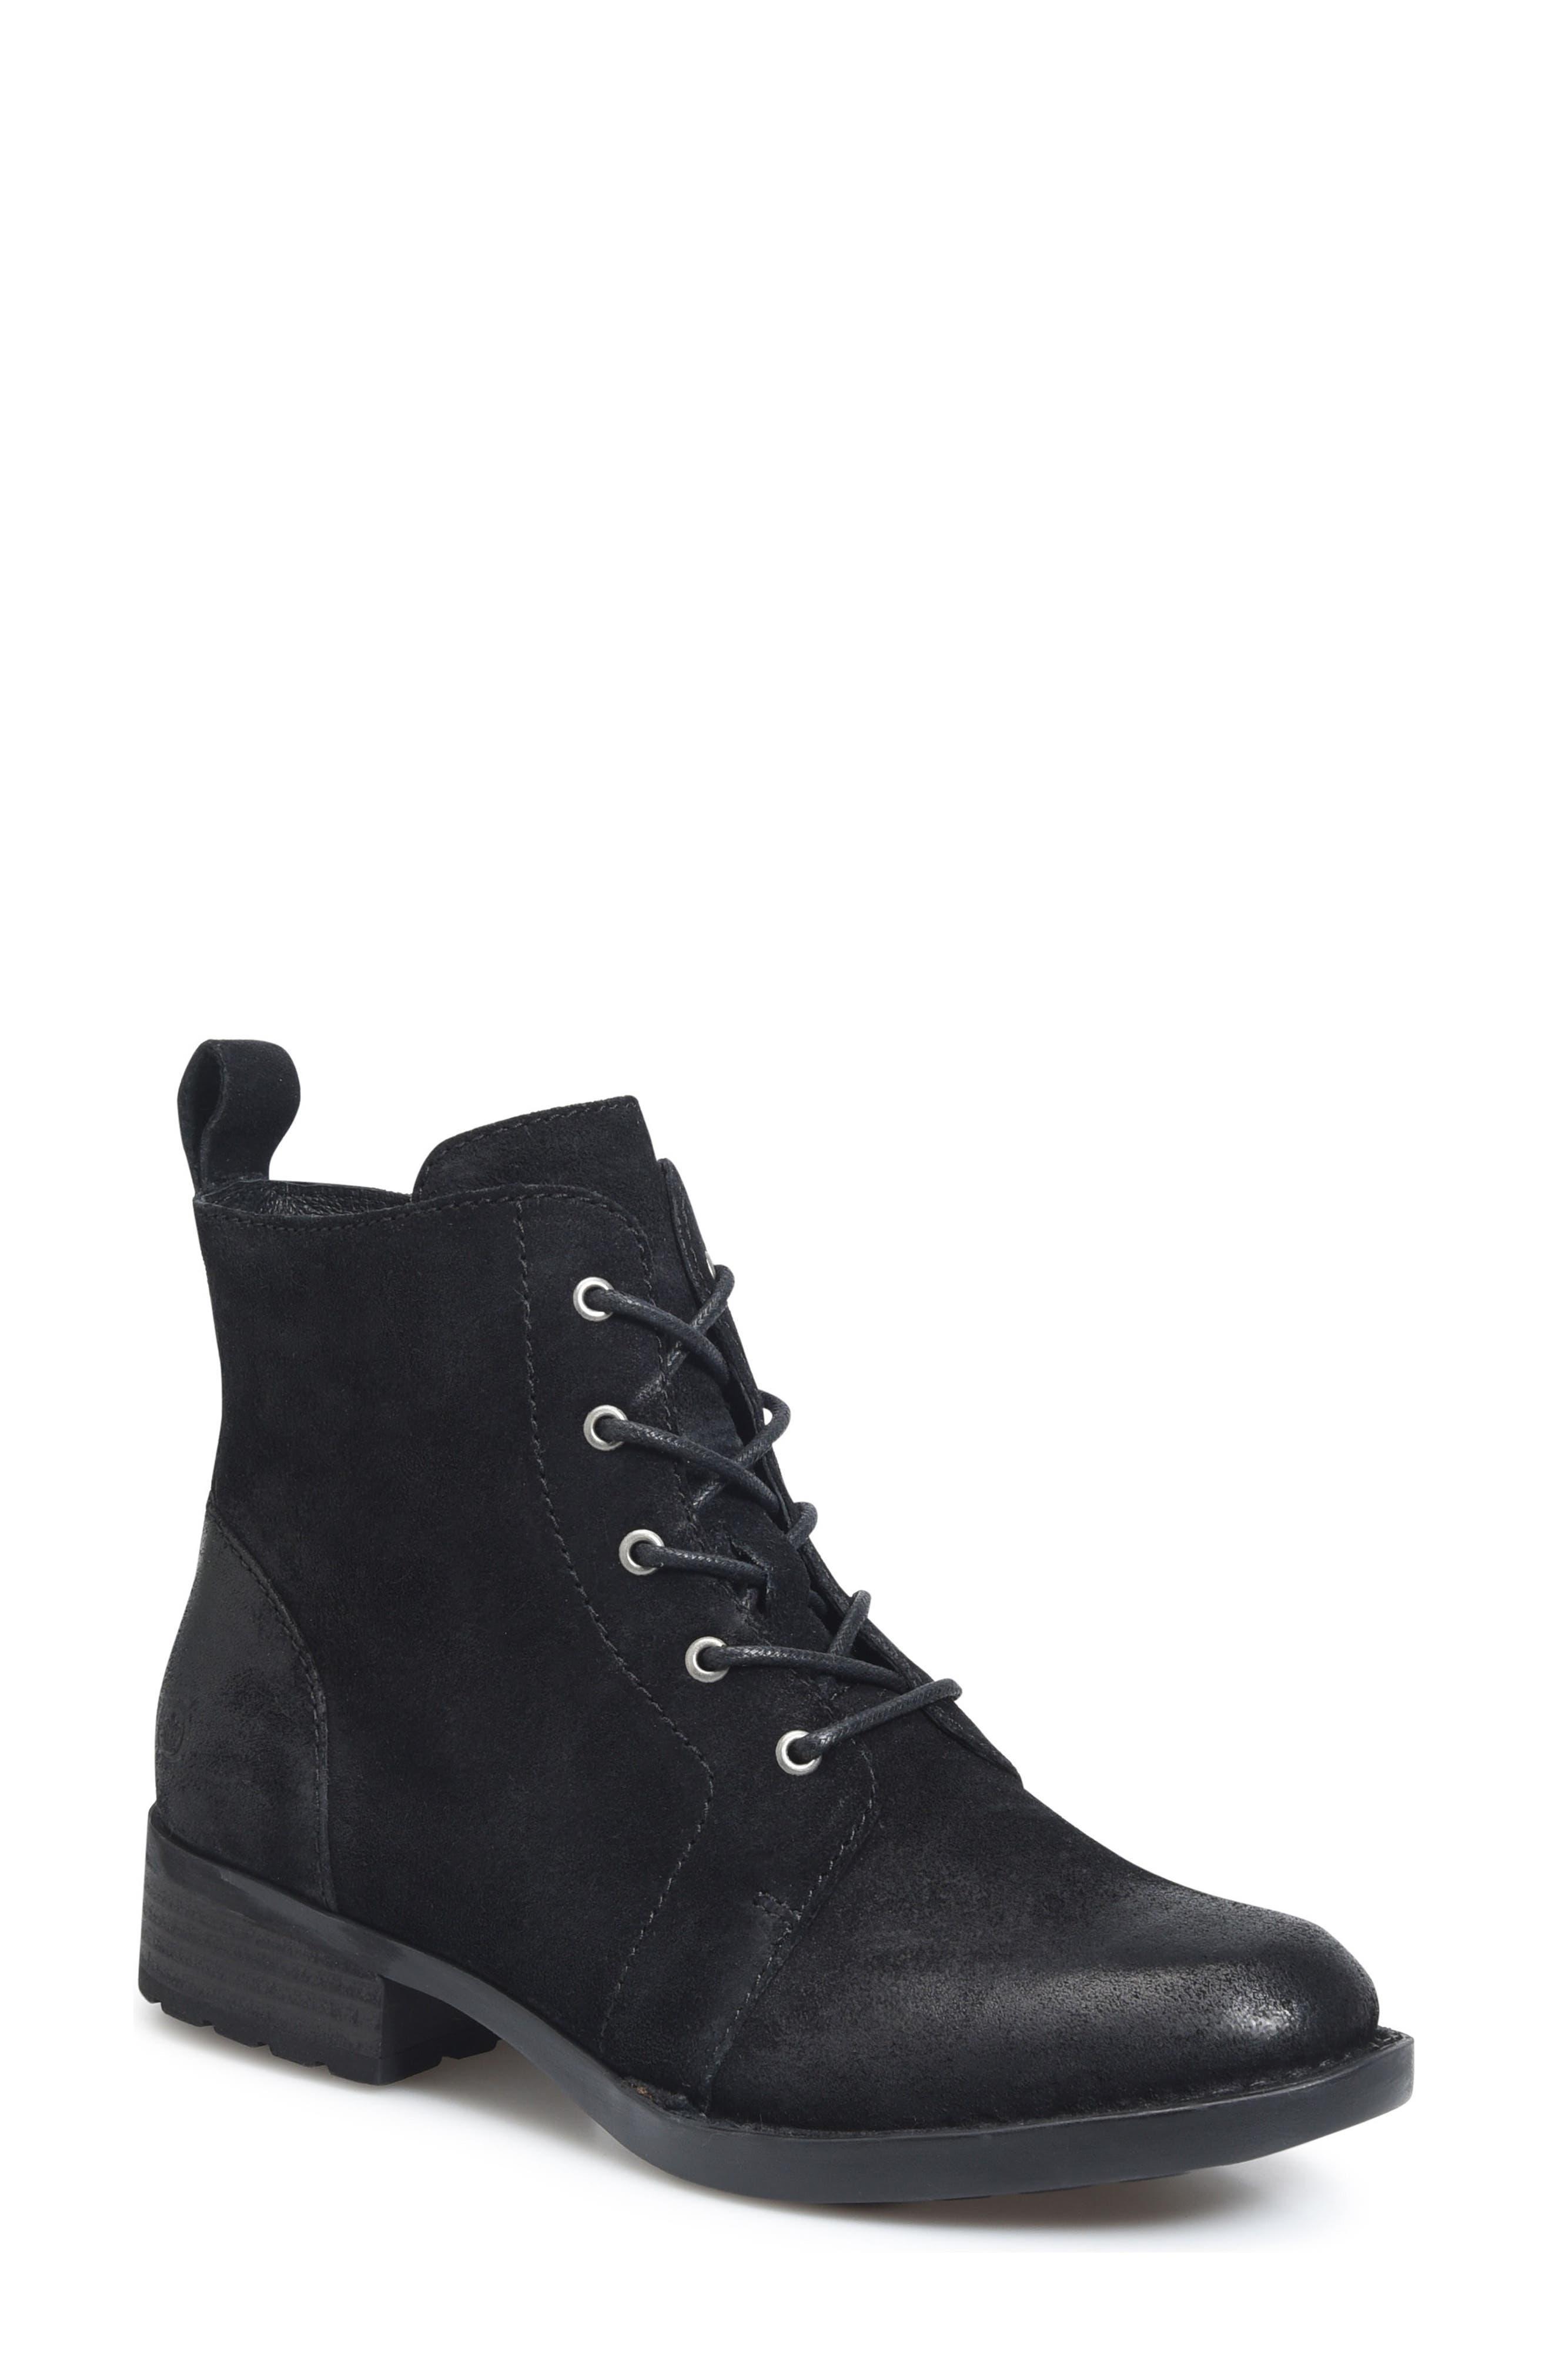 Børn Troye Vintage Lace-Up Boot (Women)